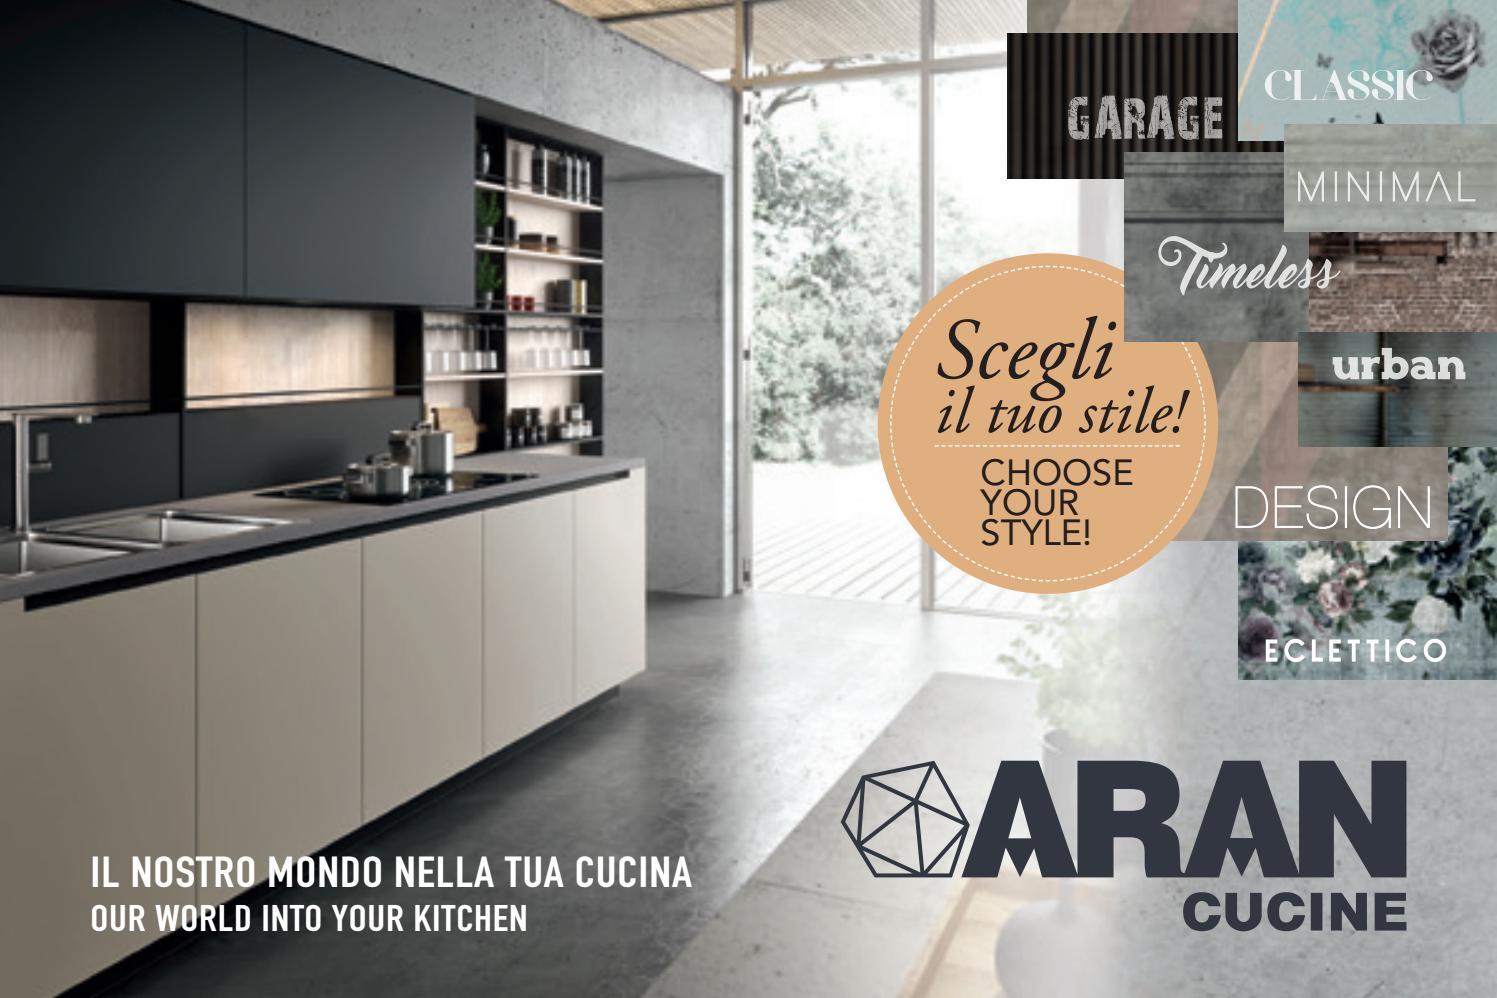 Aran Cucine » Aran Cucine Rivenditori - Ispirazioni Design dell ...